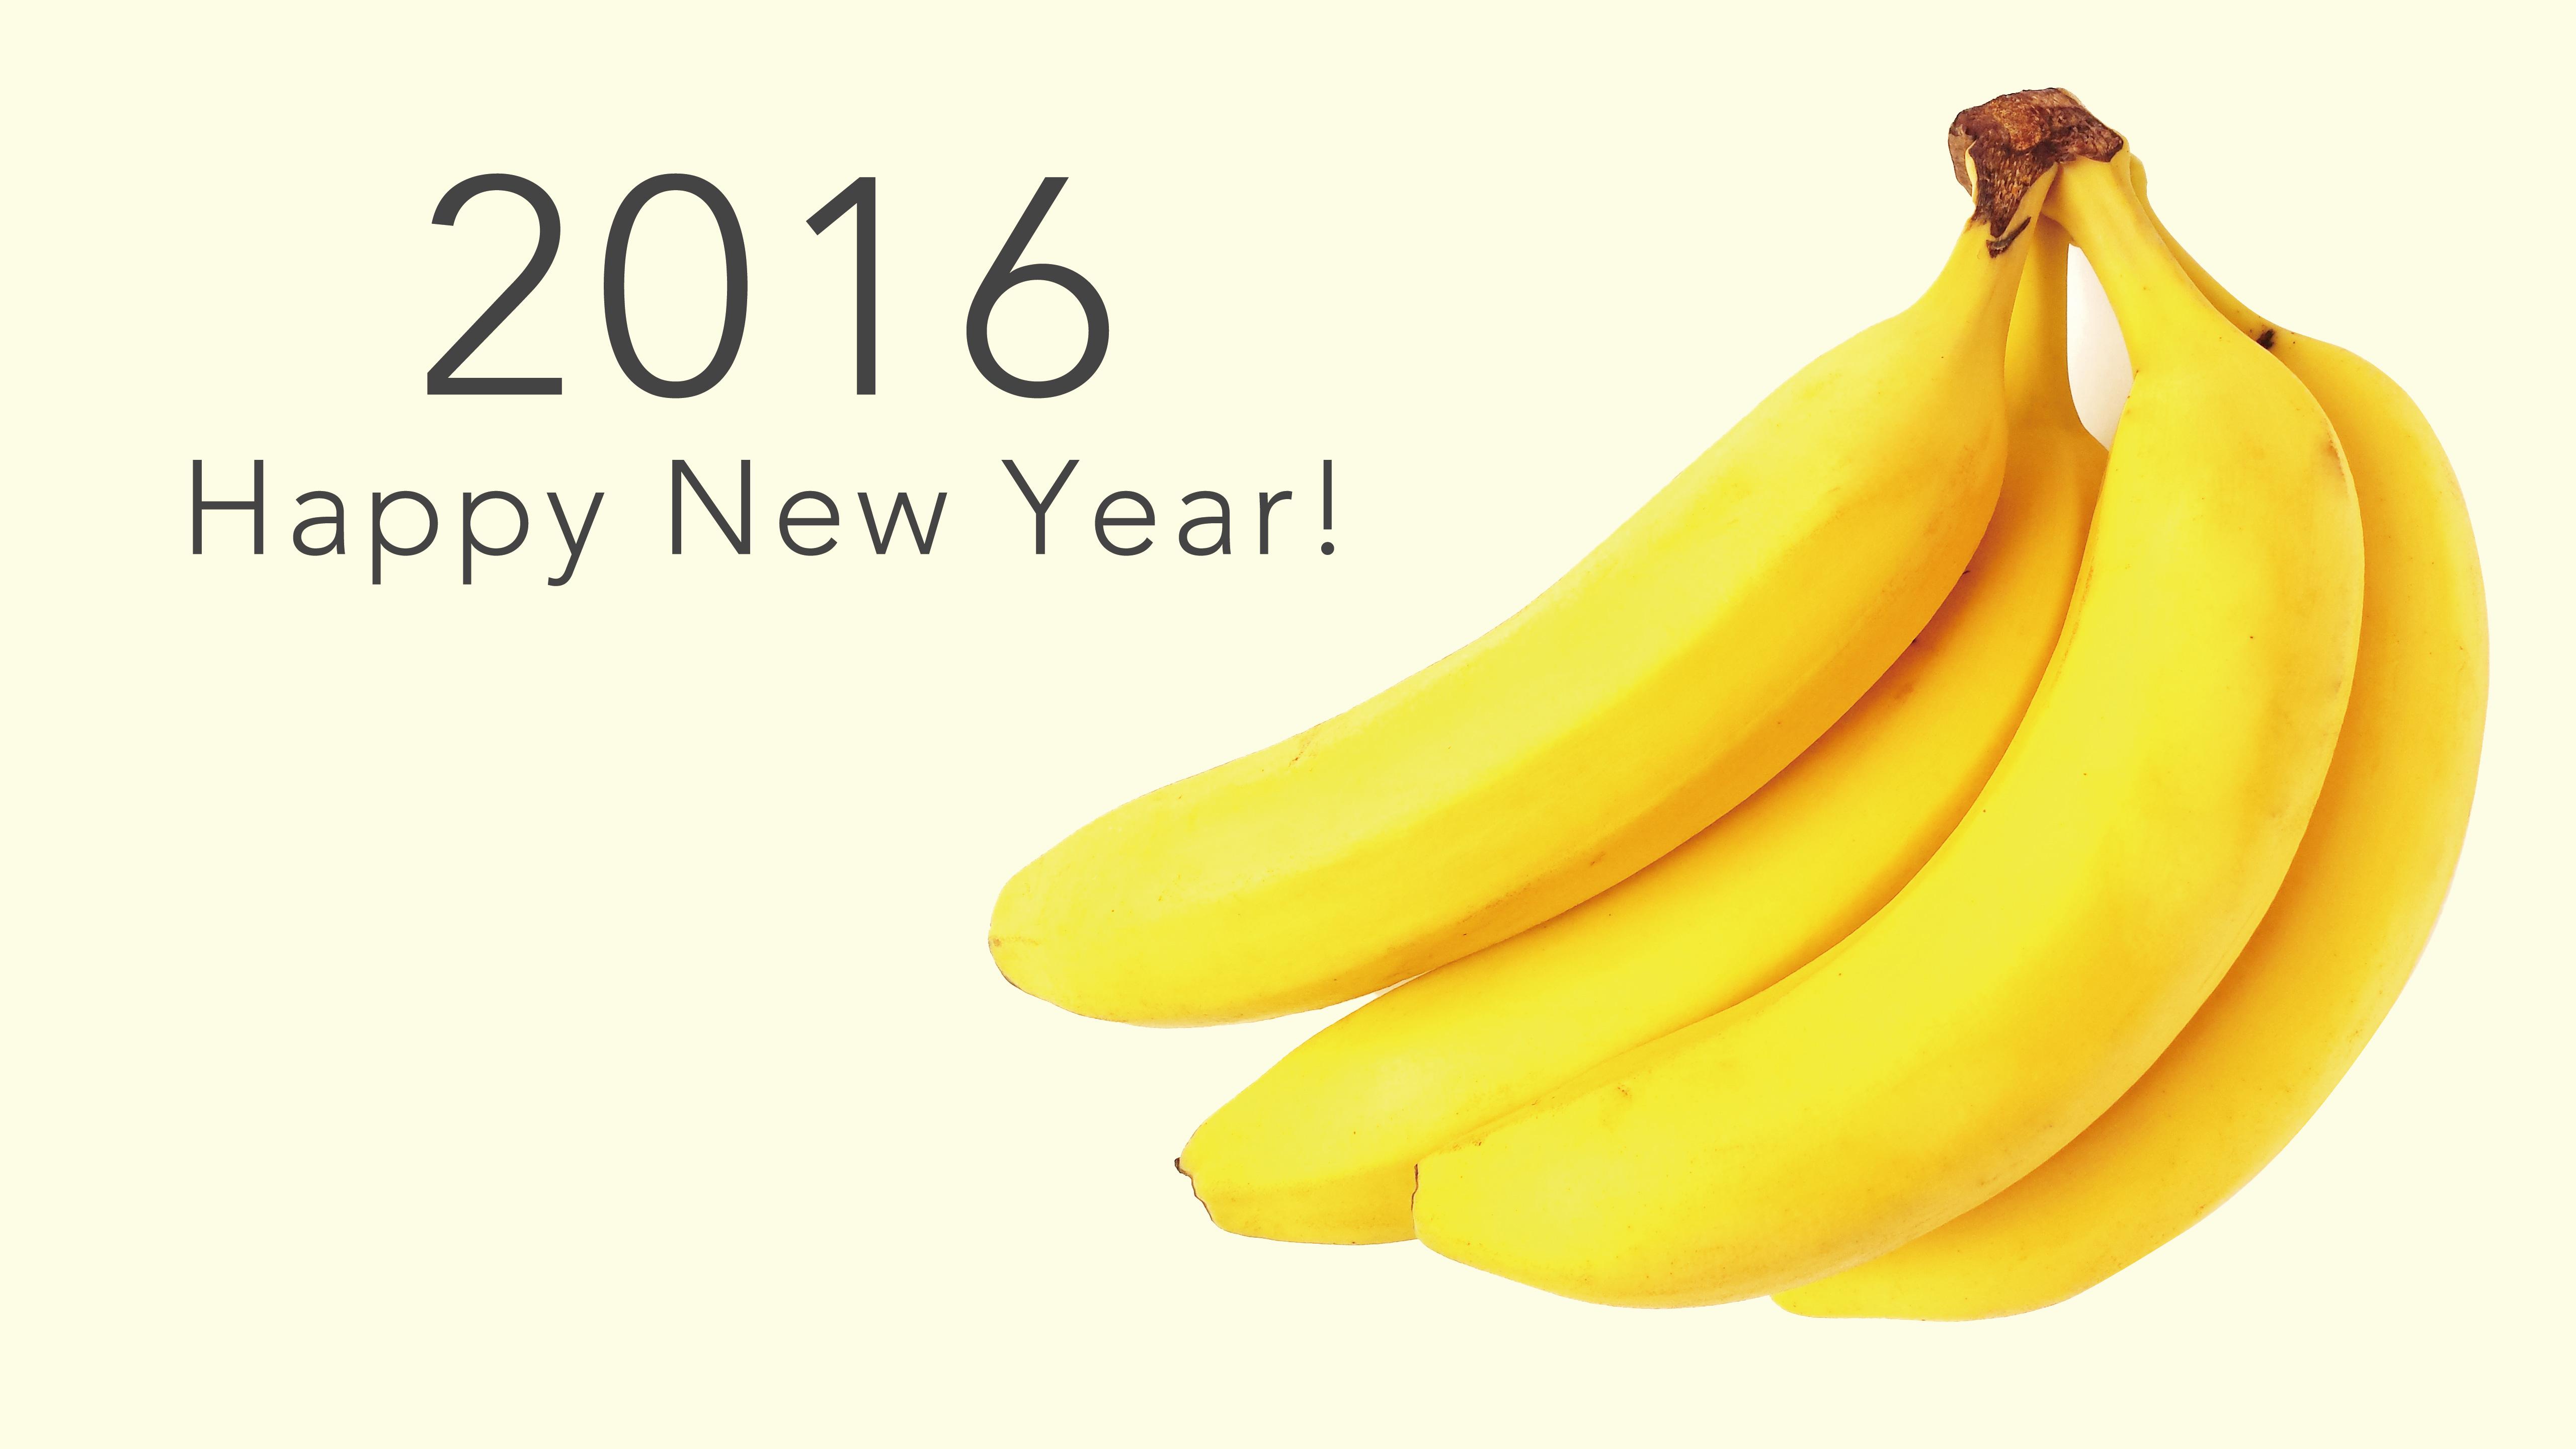 happy news year 2016 banana yellow wallpaper | wallpaper sc